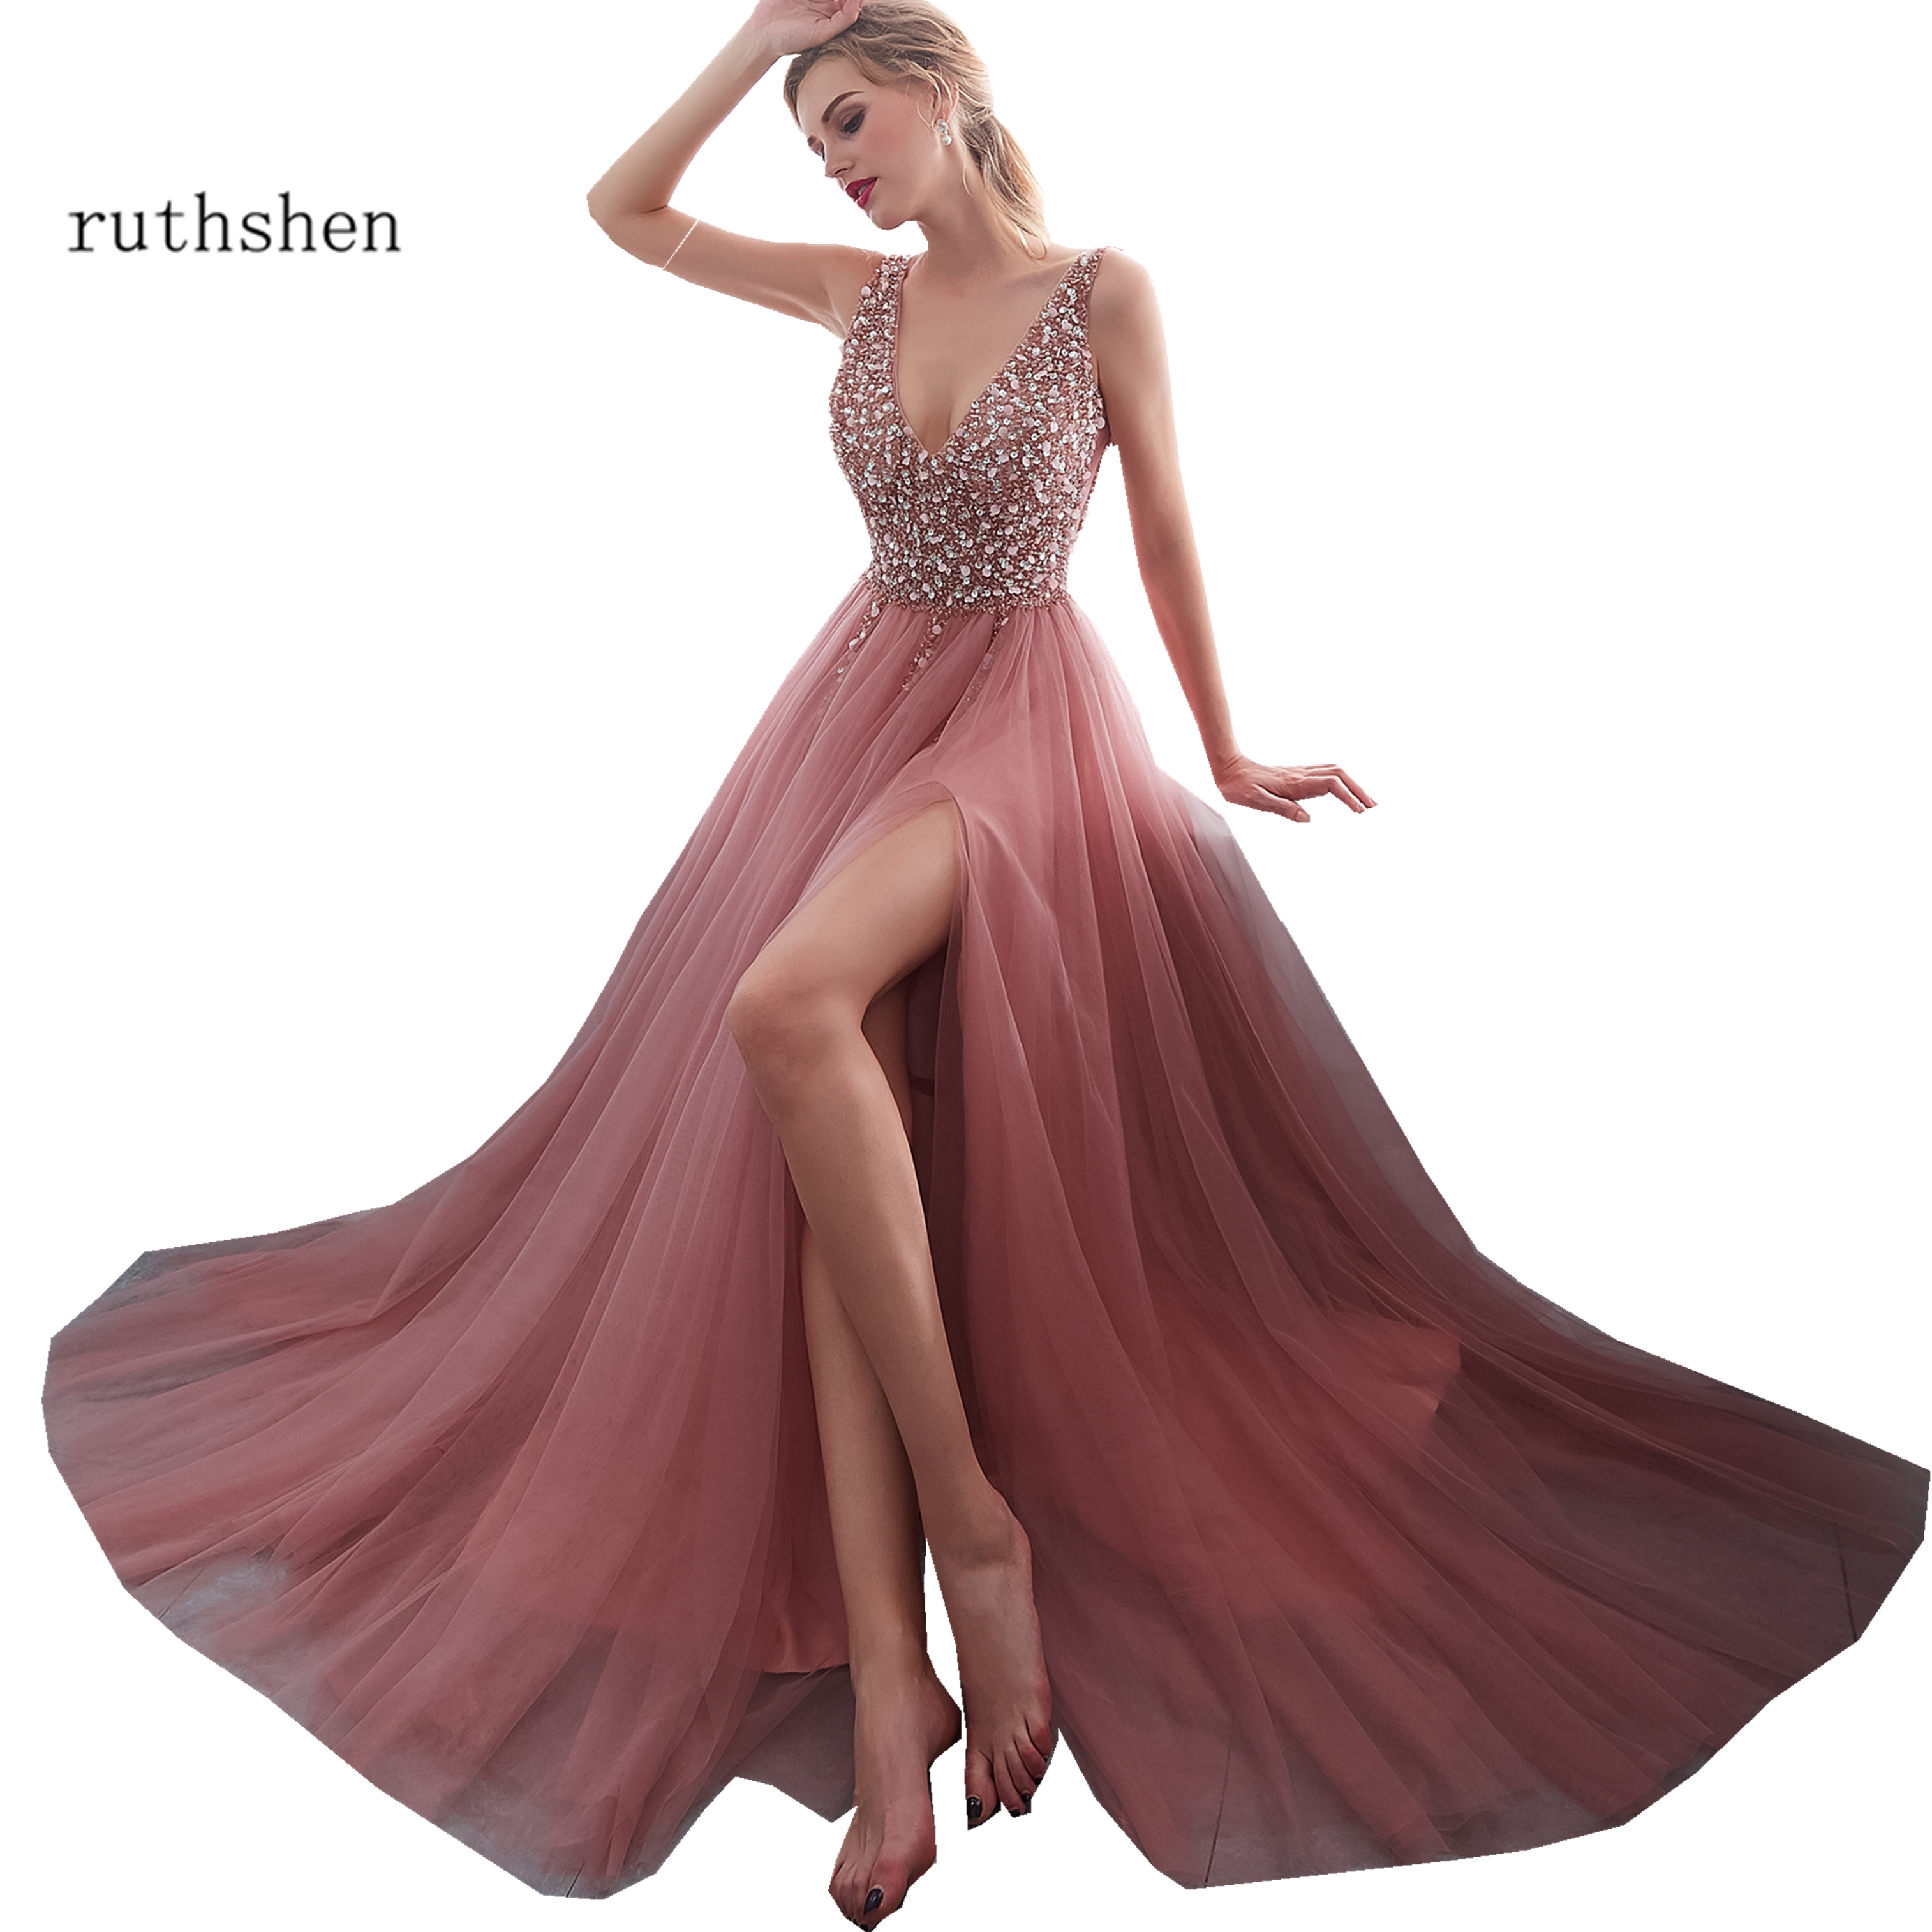 Beaded Prom Dresses 2019 New V Neck Pink High Split Tulle Evening Gown Long Formal A-Line Lace Up Backless Vestido Longo Festa